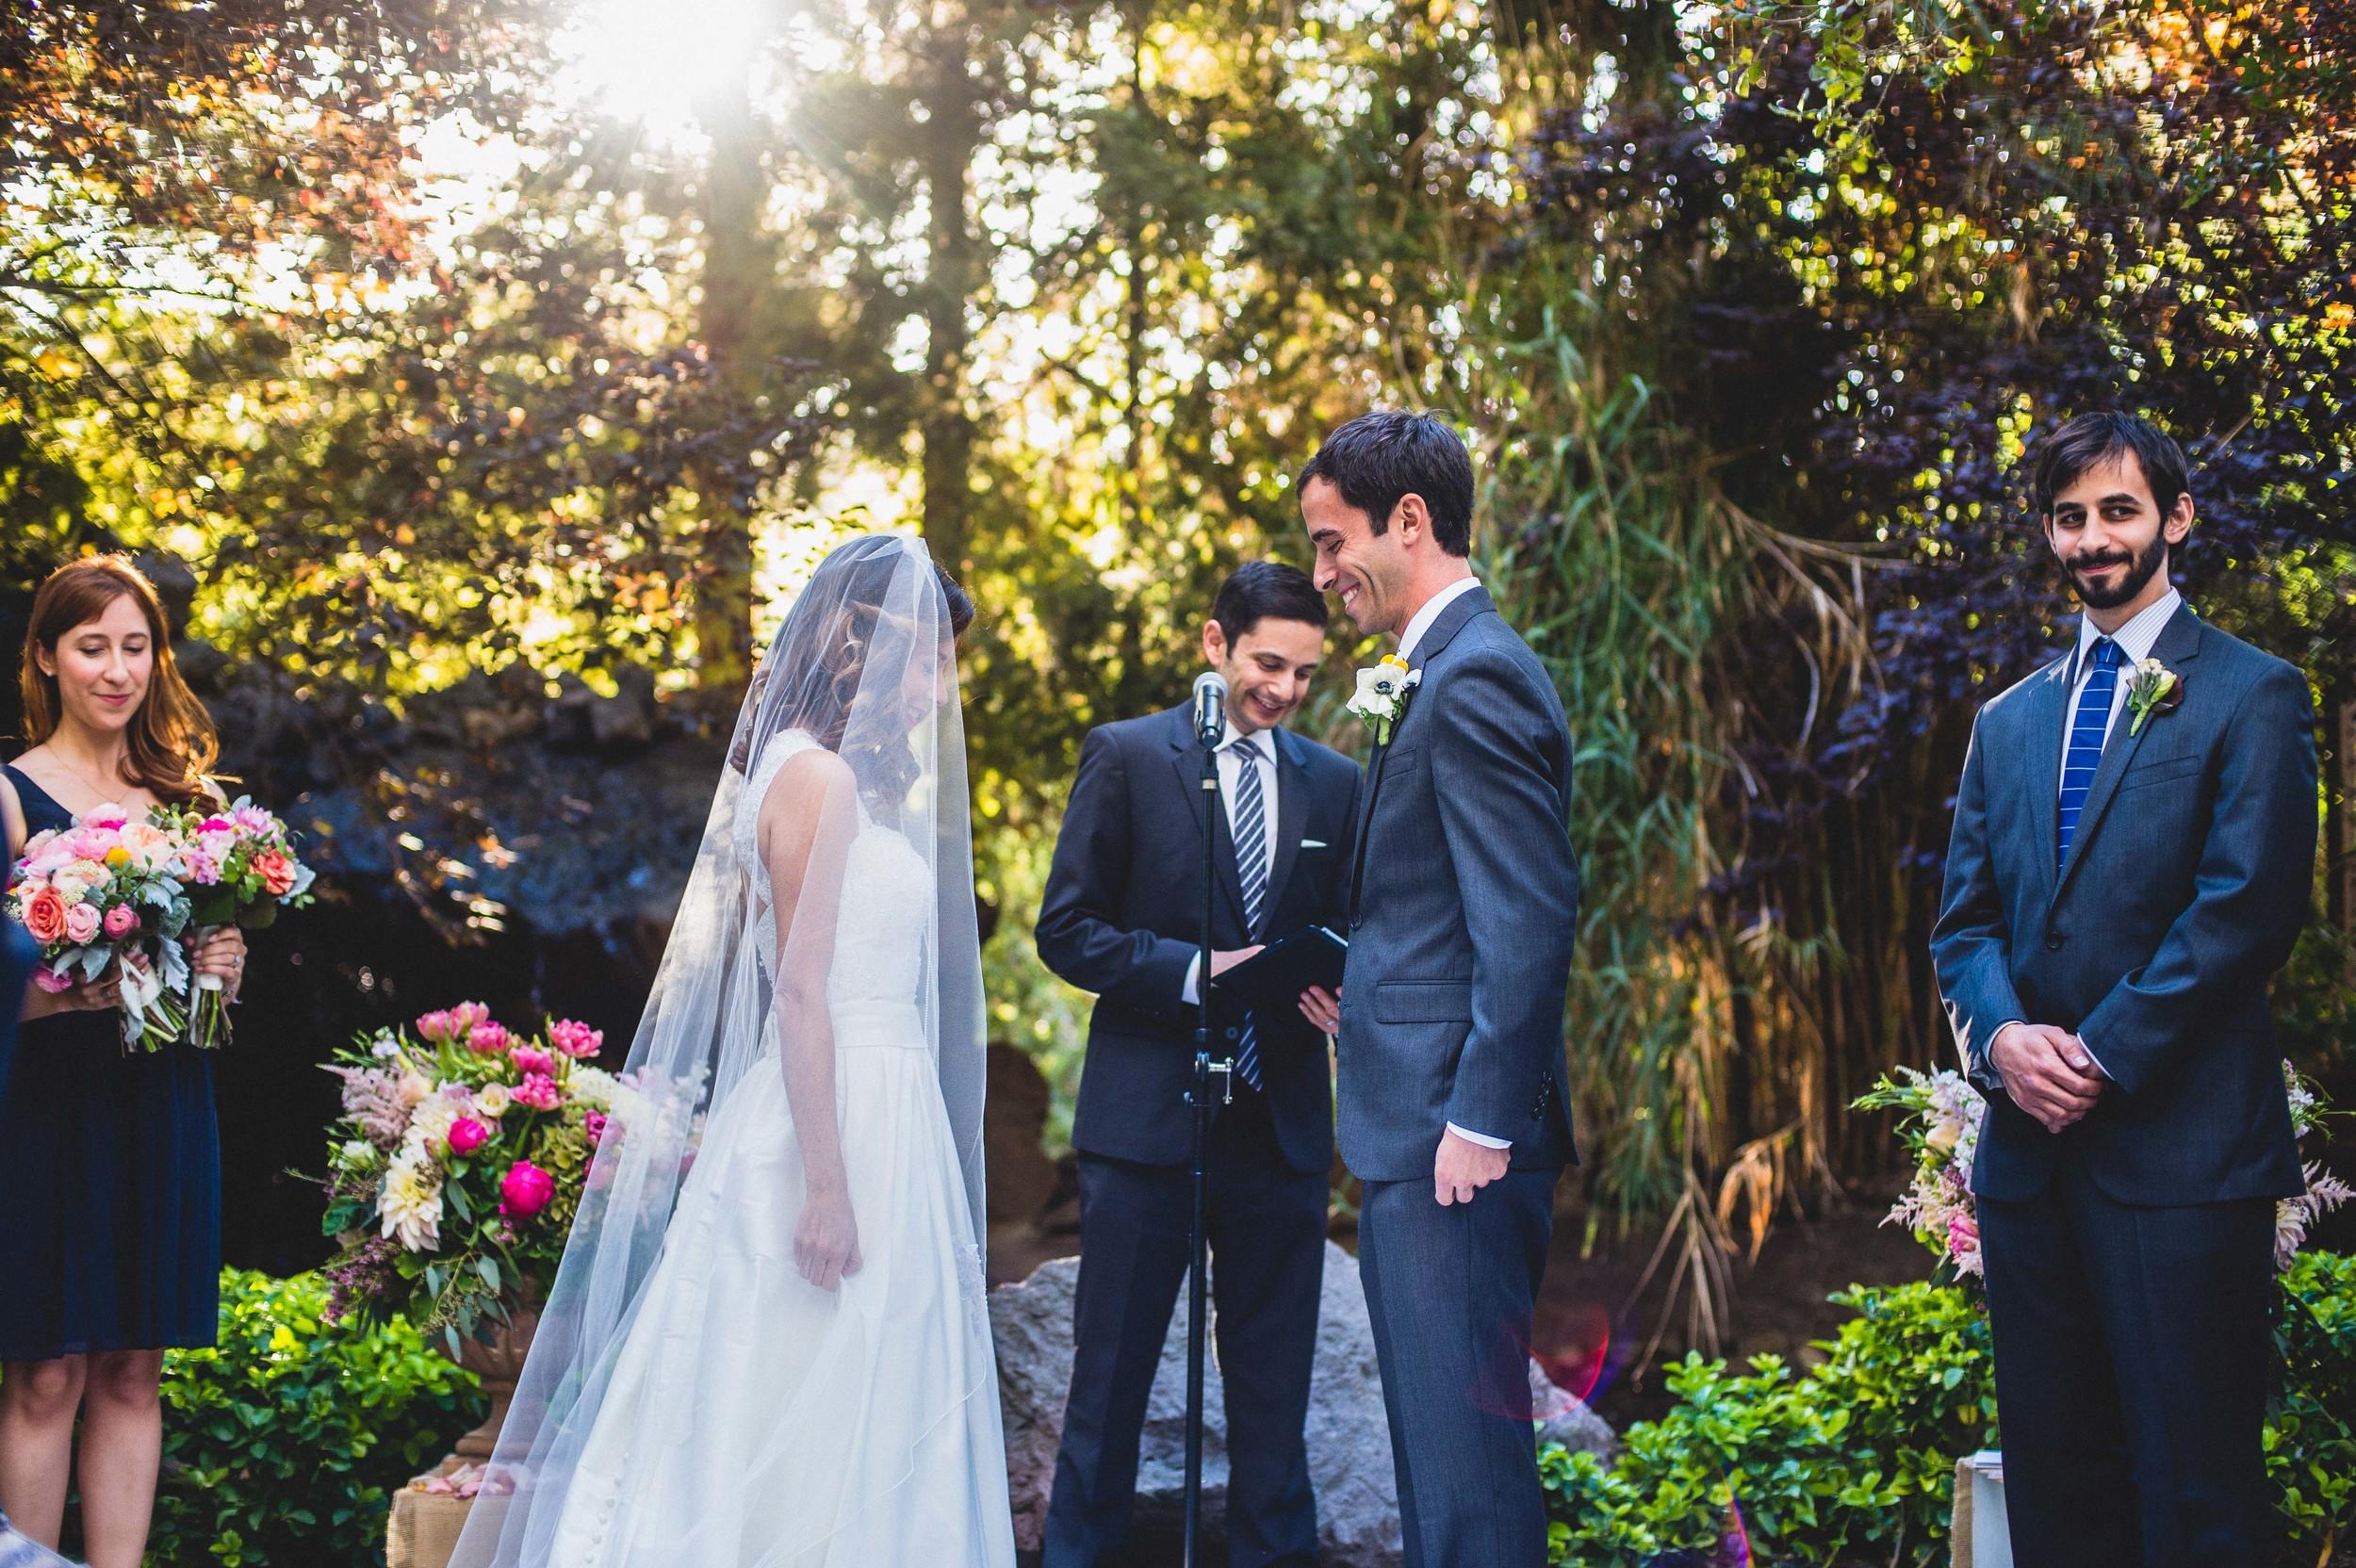 los angeles malibe cafe calamigos ranch wedding phtoographer edward lai-41.jpg